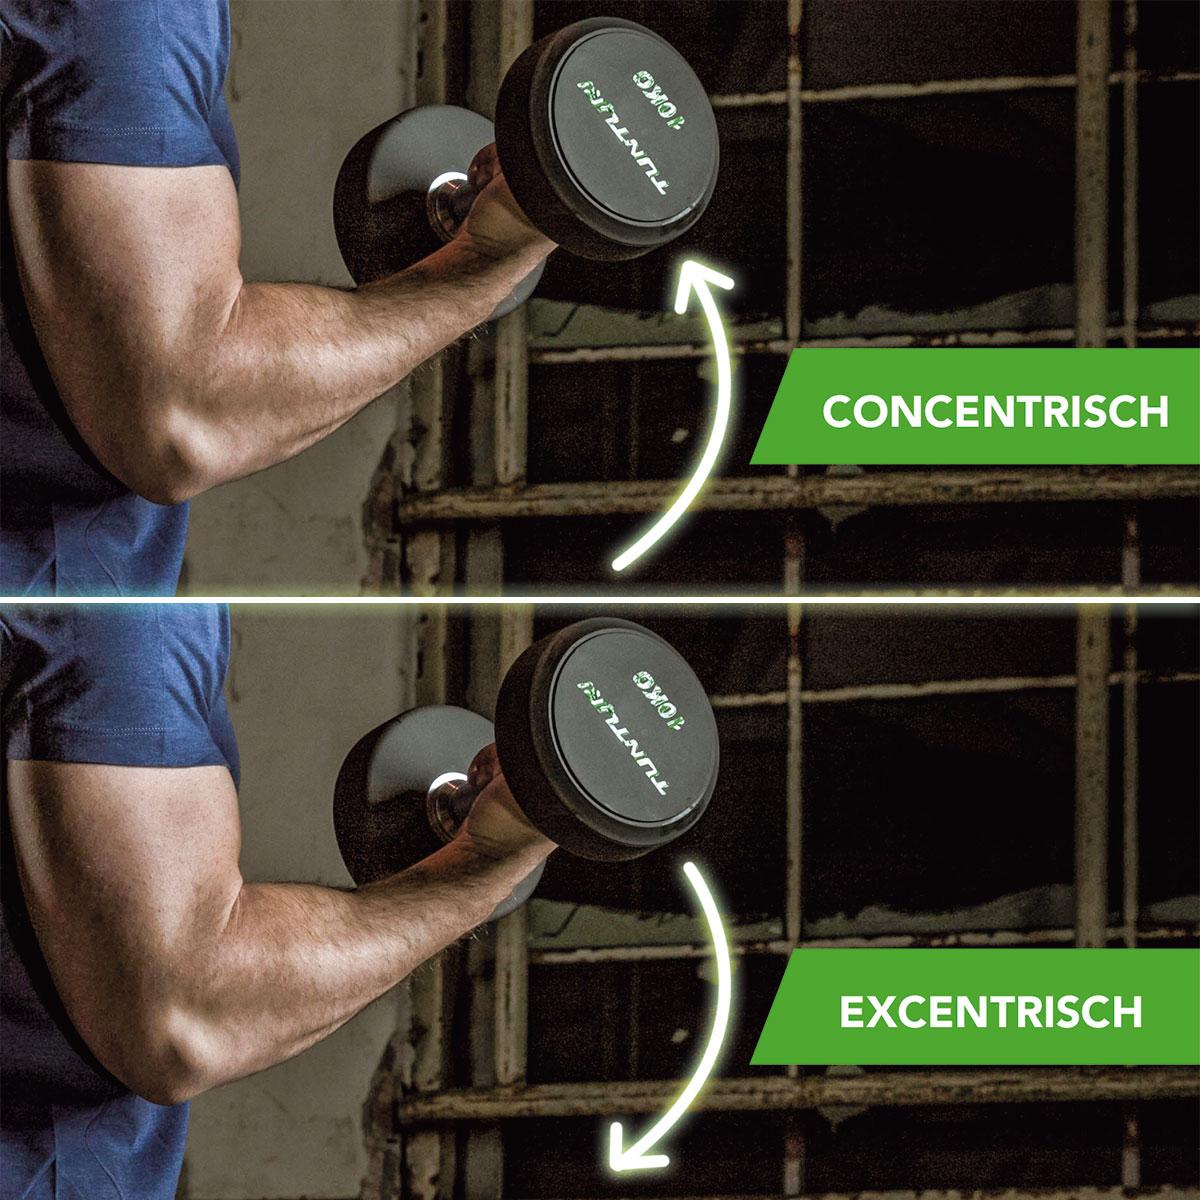 <h3><strong>Concentrisch en excentrisch</strong></h3>